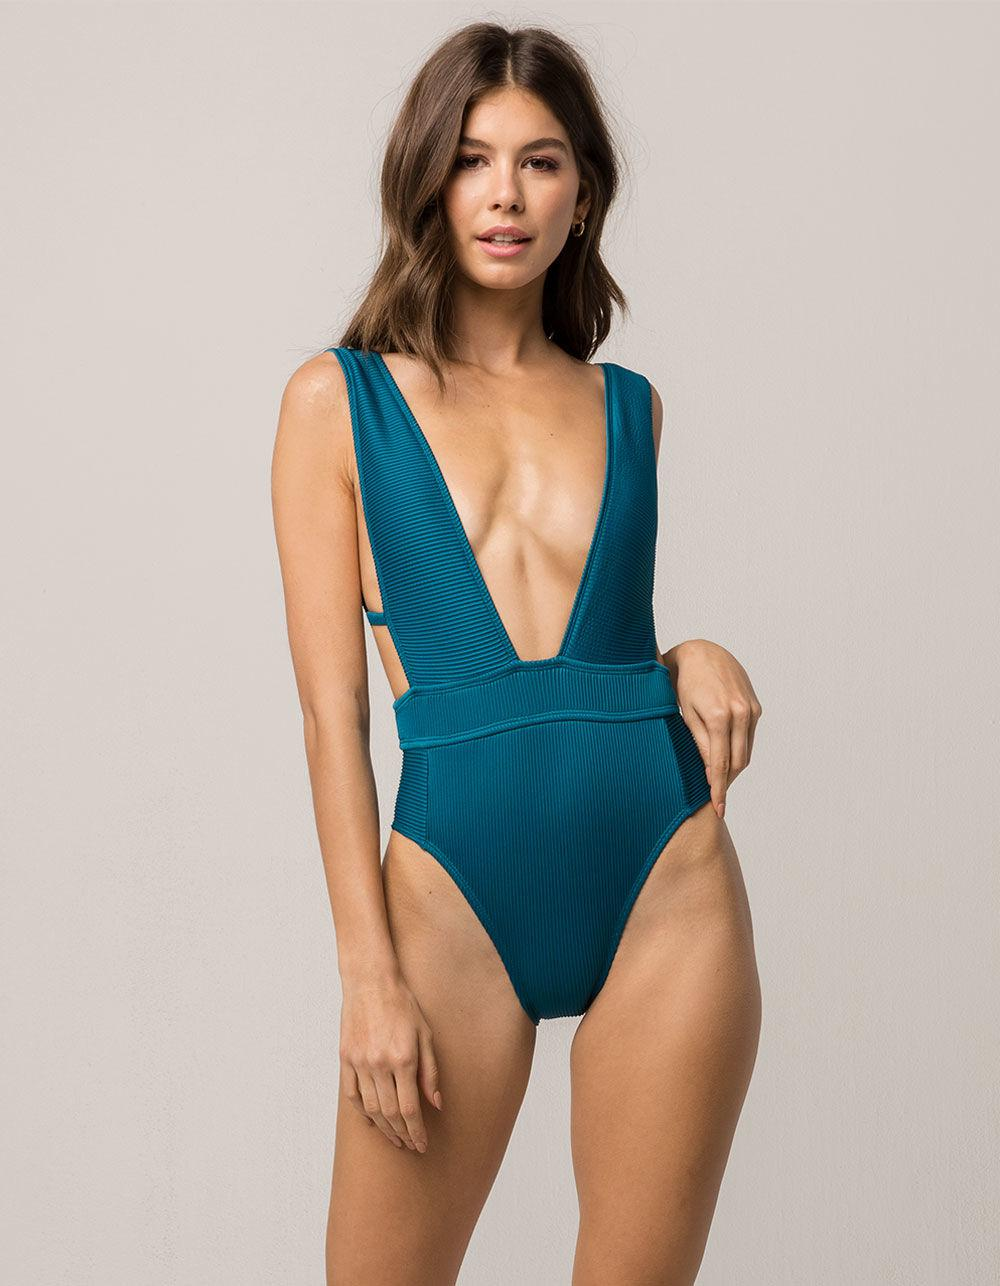 c88eb6423 Bikini Lab Ribbed One Piece Swimsuit in Blue - Lyst